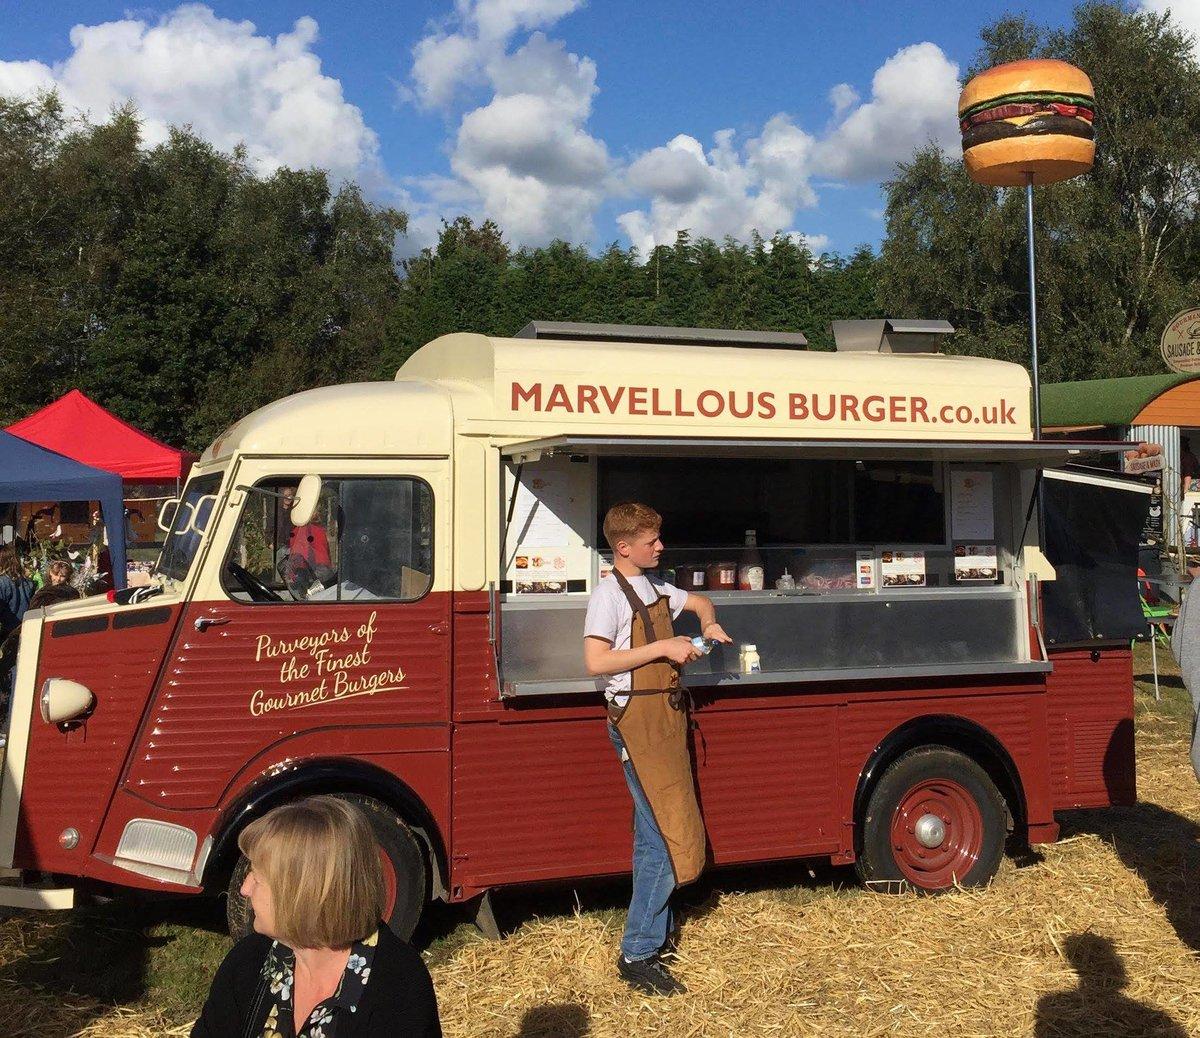 1966 Citroen H Van Burger catering conversion For Sale (picture 1 of 3)